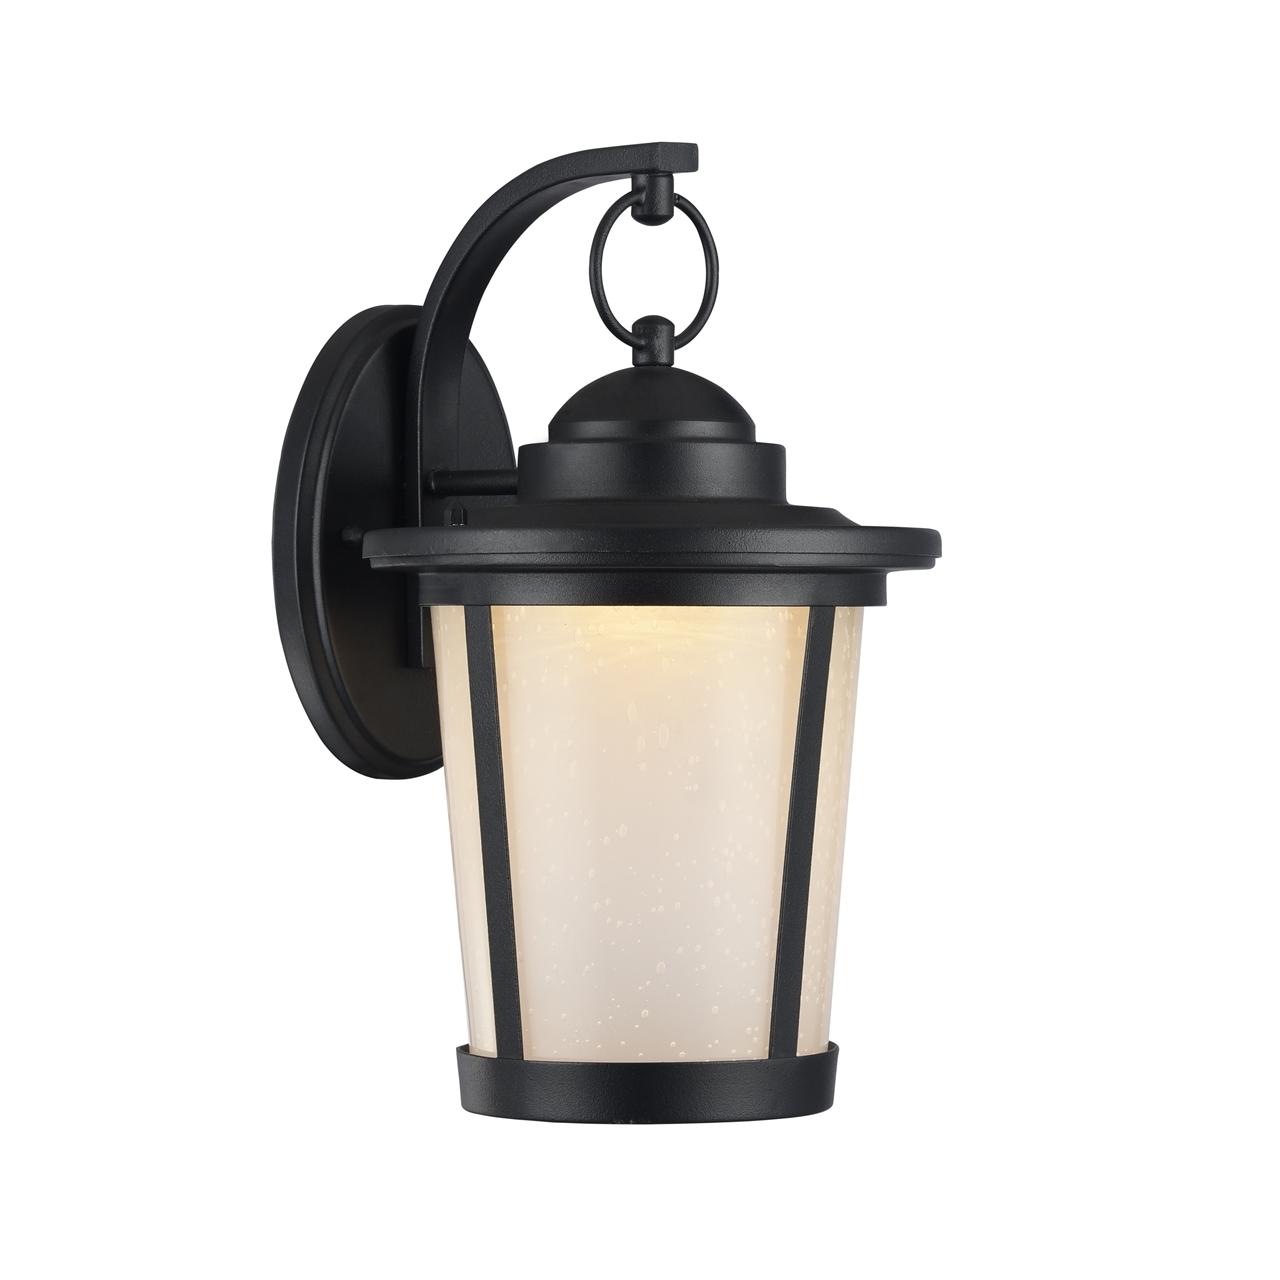 CHLOE Lighting, Inc CHLOE Lighting ABBINGTON Transitional ... on Outdoor Wall Sconce Lighting id=67042